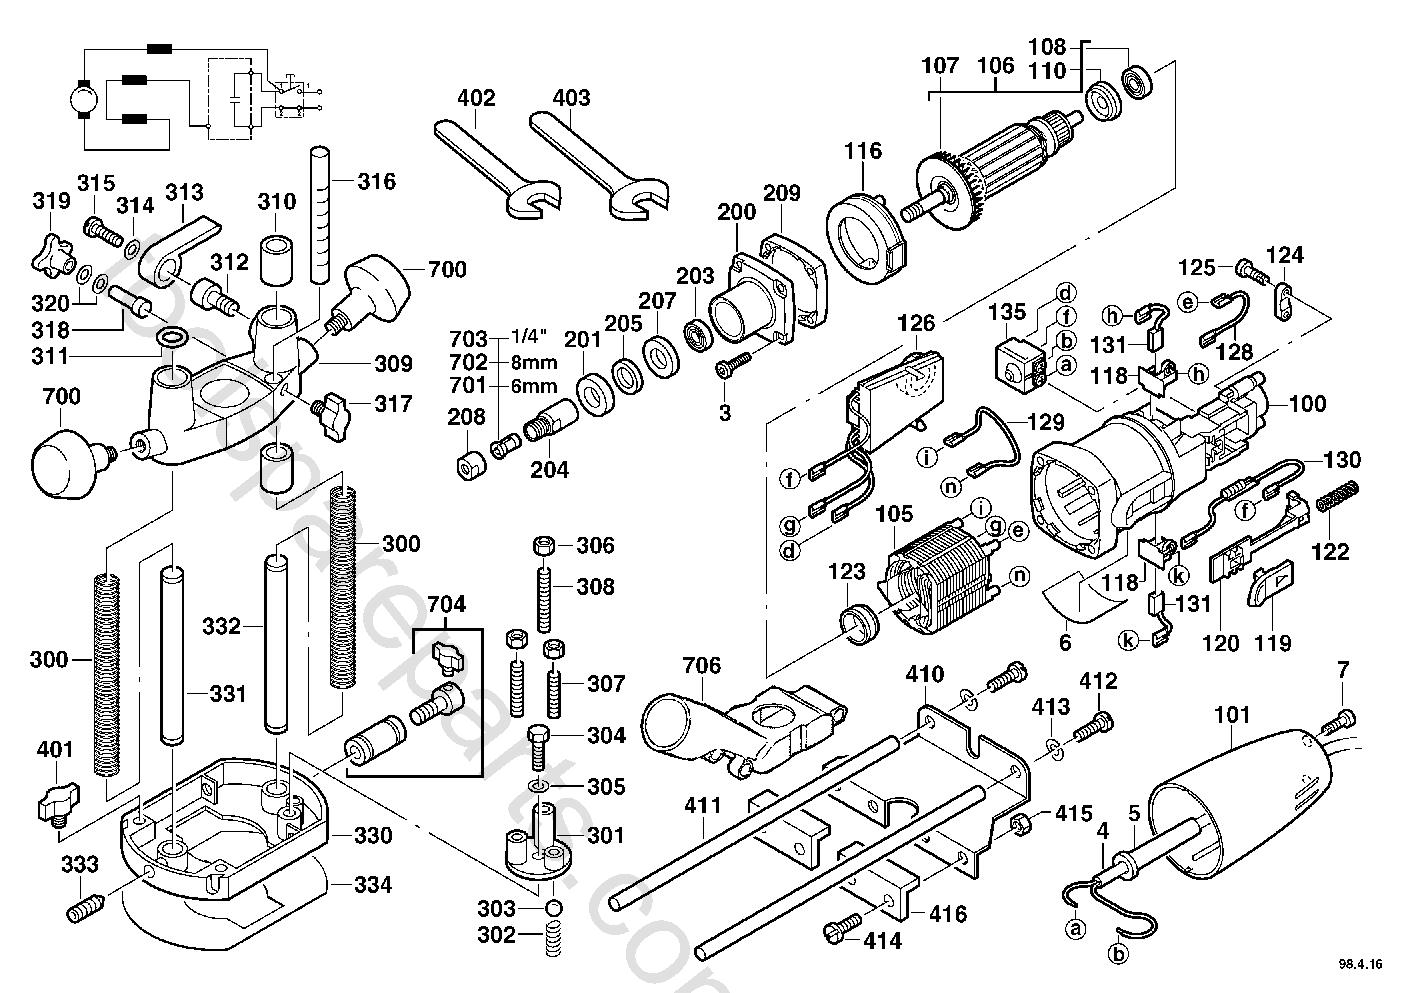 AEG OFE710  Diagram 1